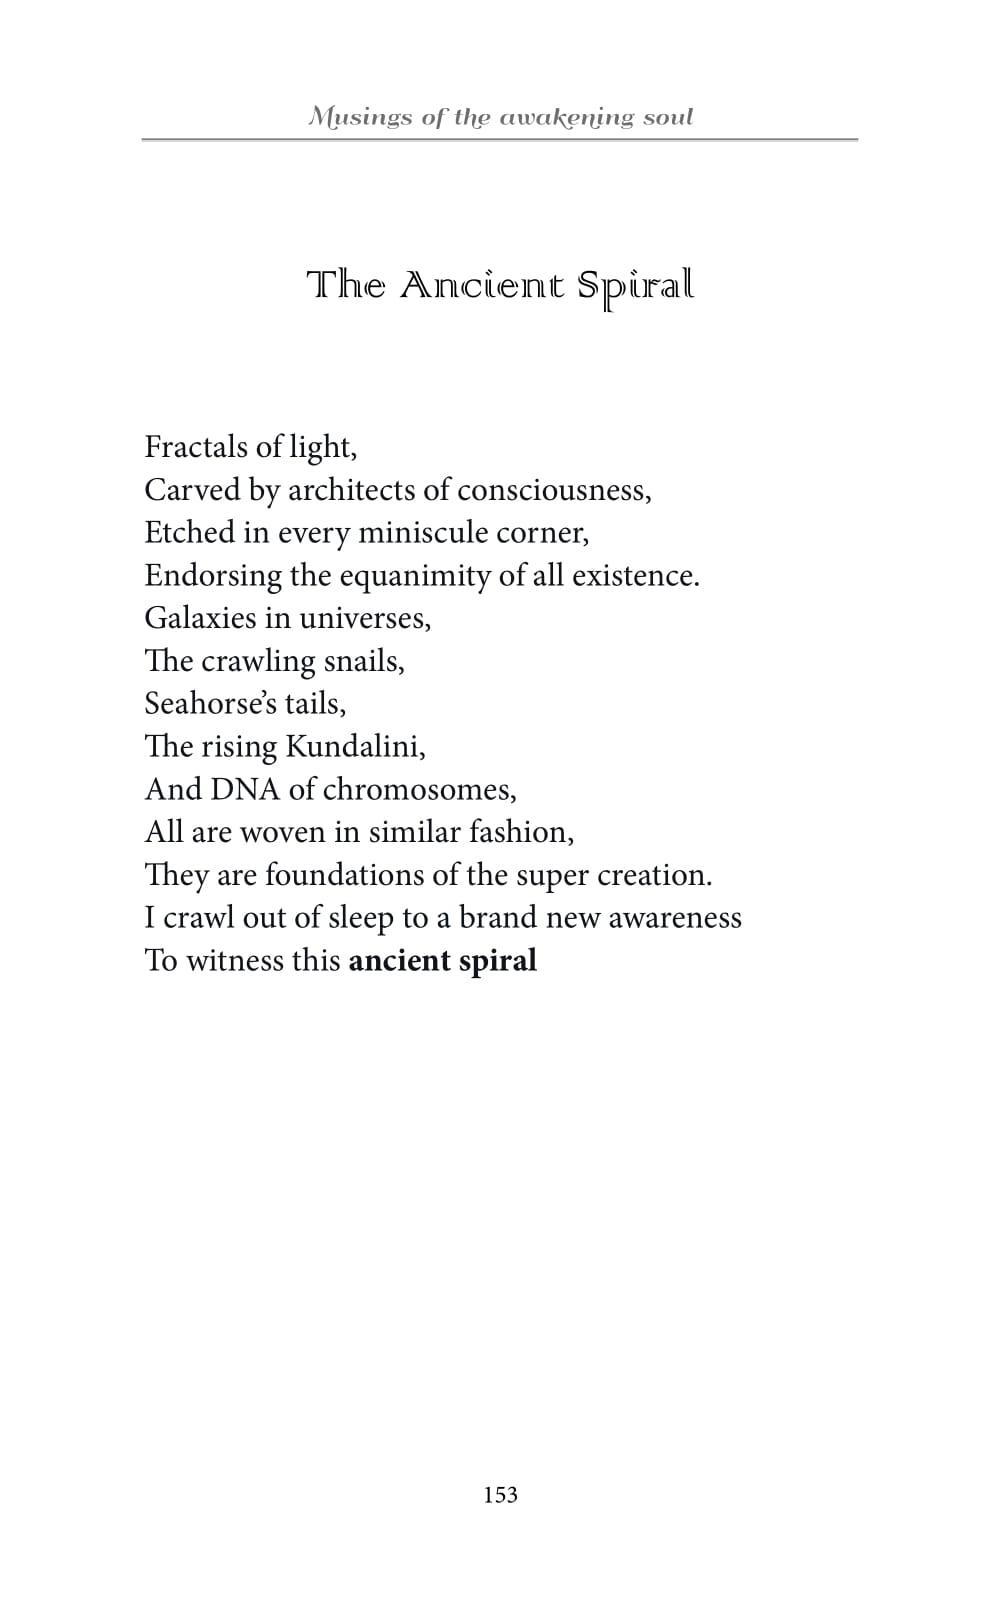 Musings-of-the-Awakening-Soul-Book-By-Dr-Pallavi-Kwatra-178.jpg